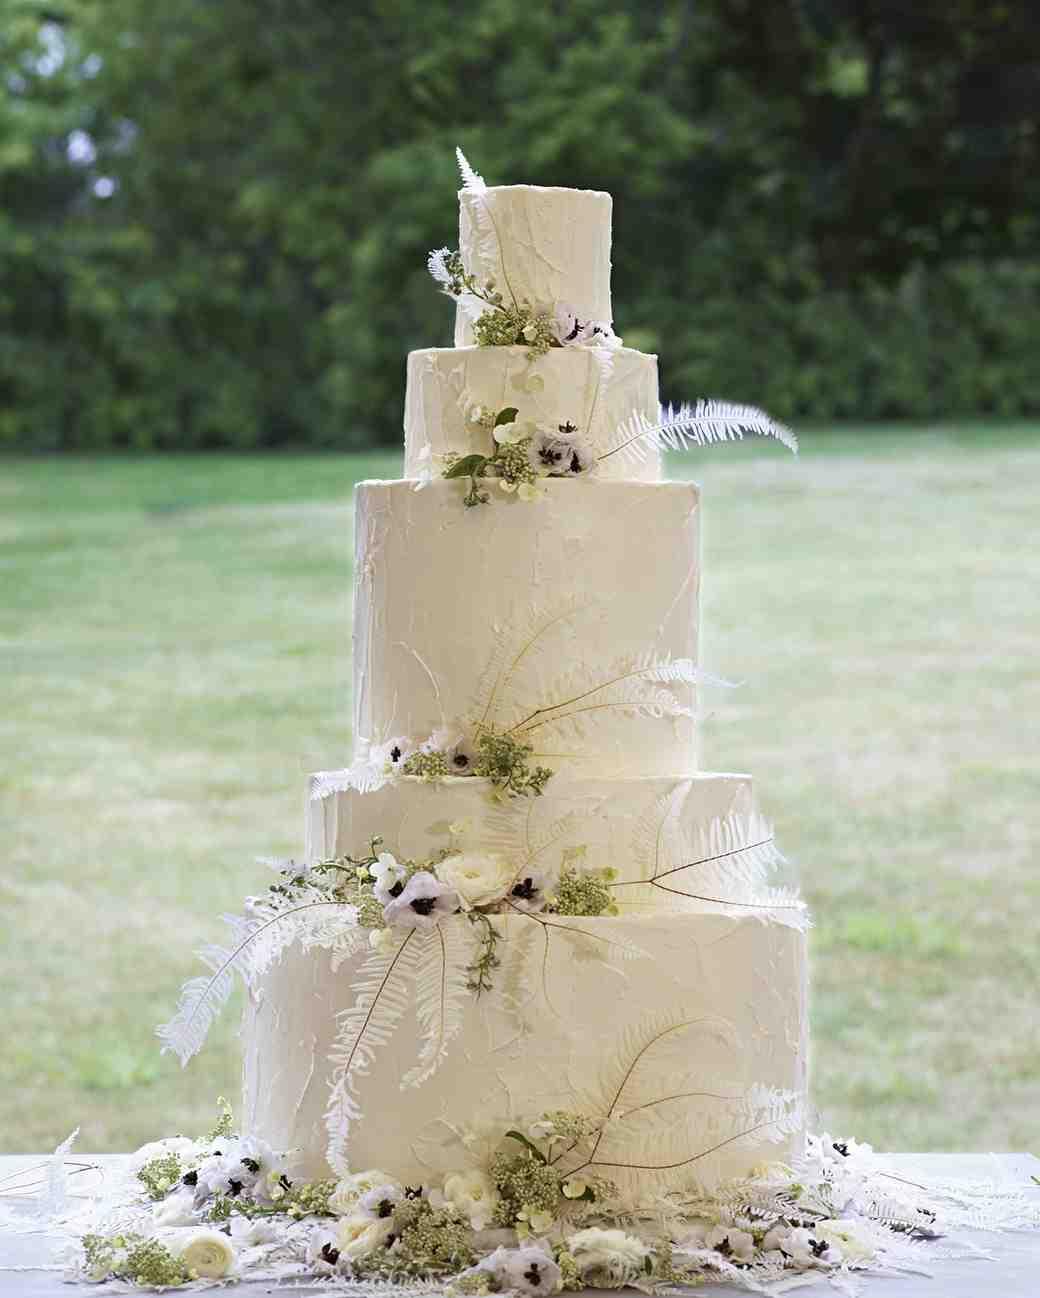 joyann jeremy wedding cake